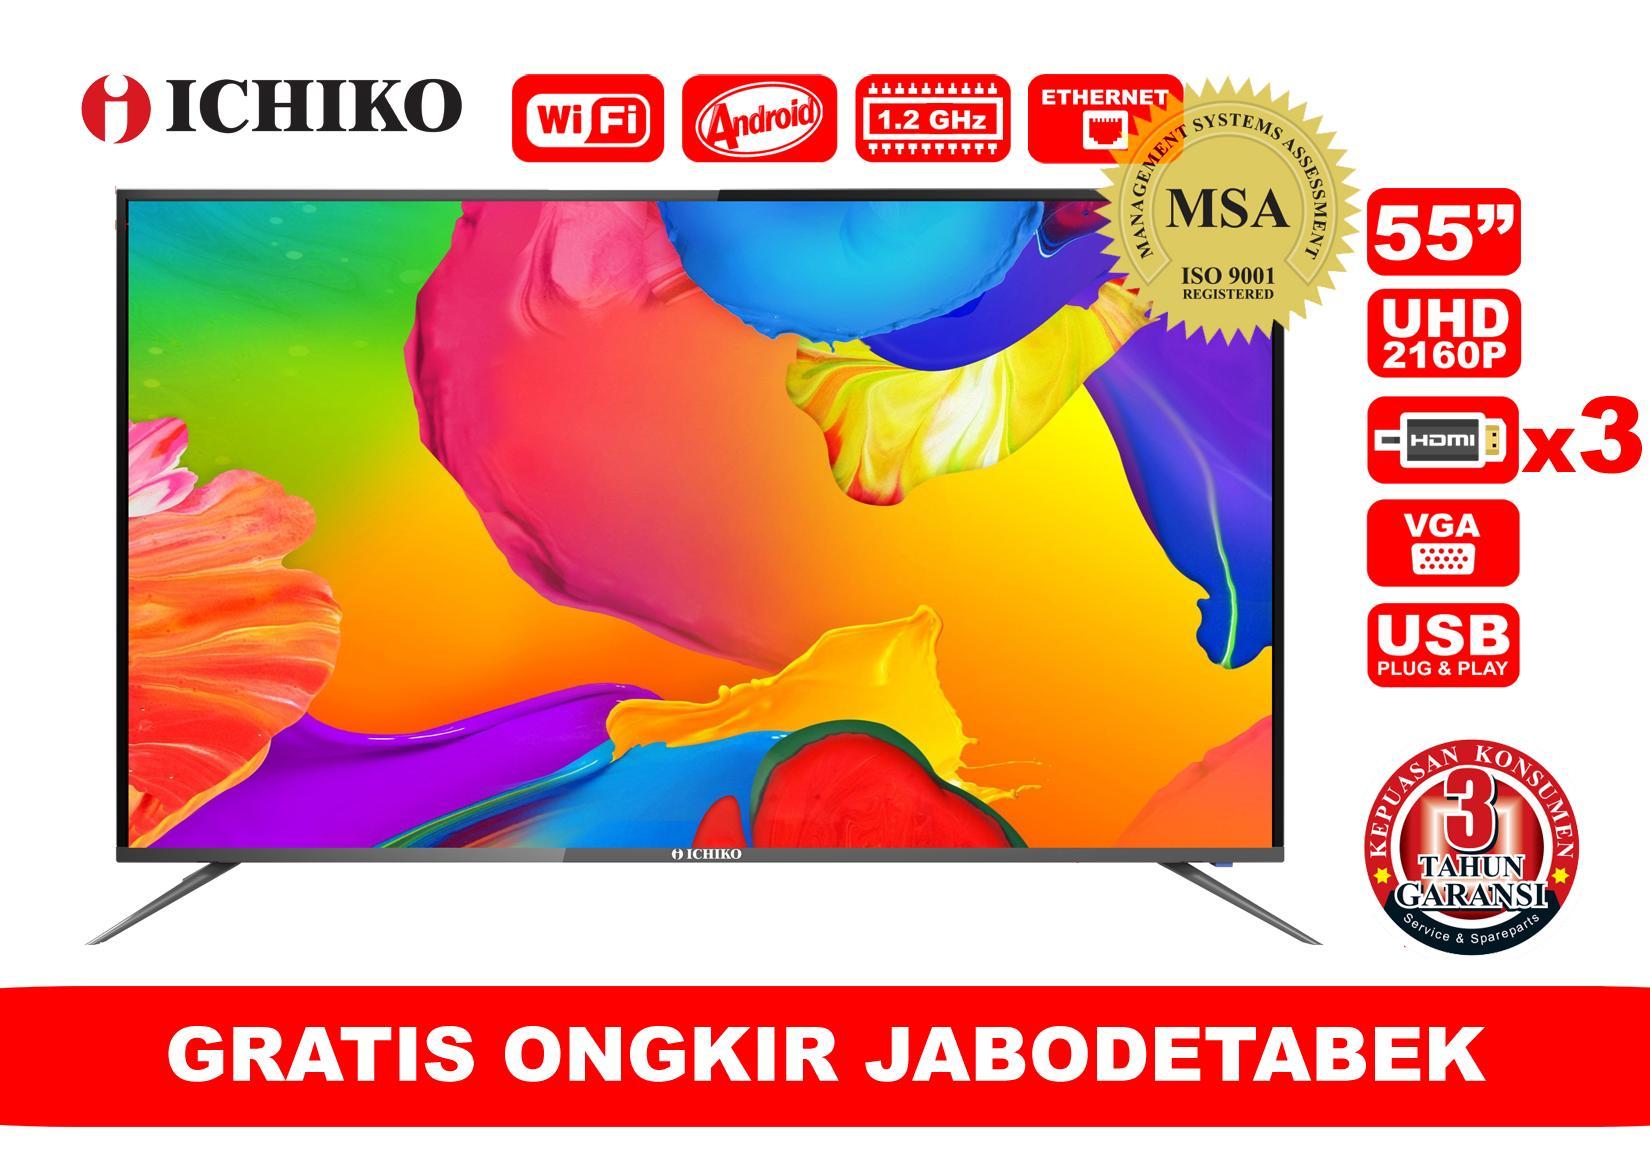 ICHIKO LED Smart TV 55 inch 4K Ultra HD (Model ST5526)